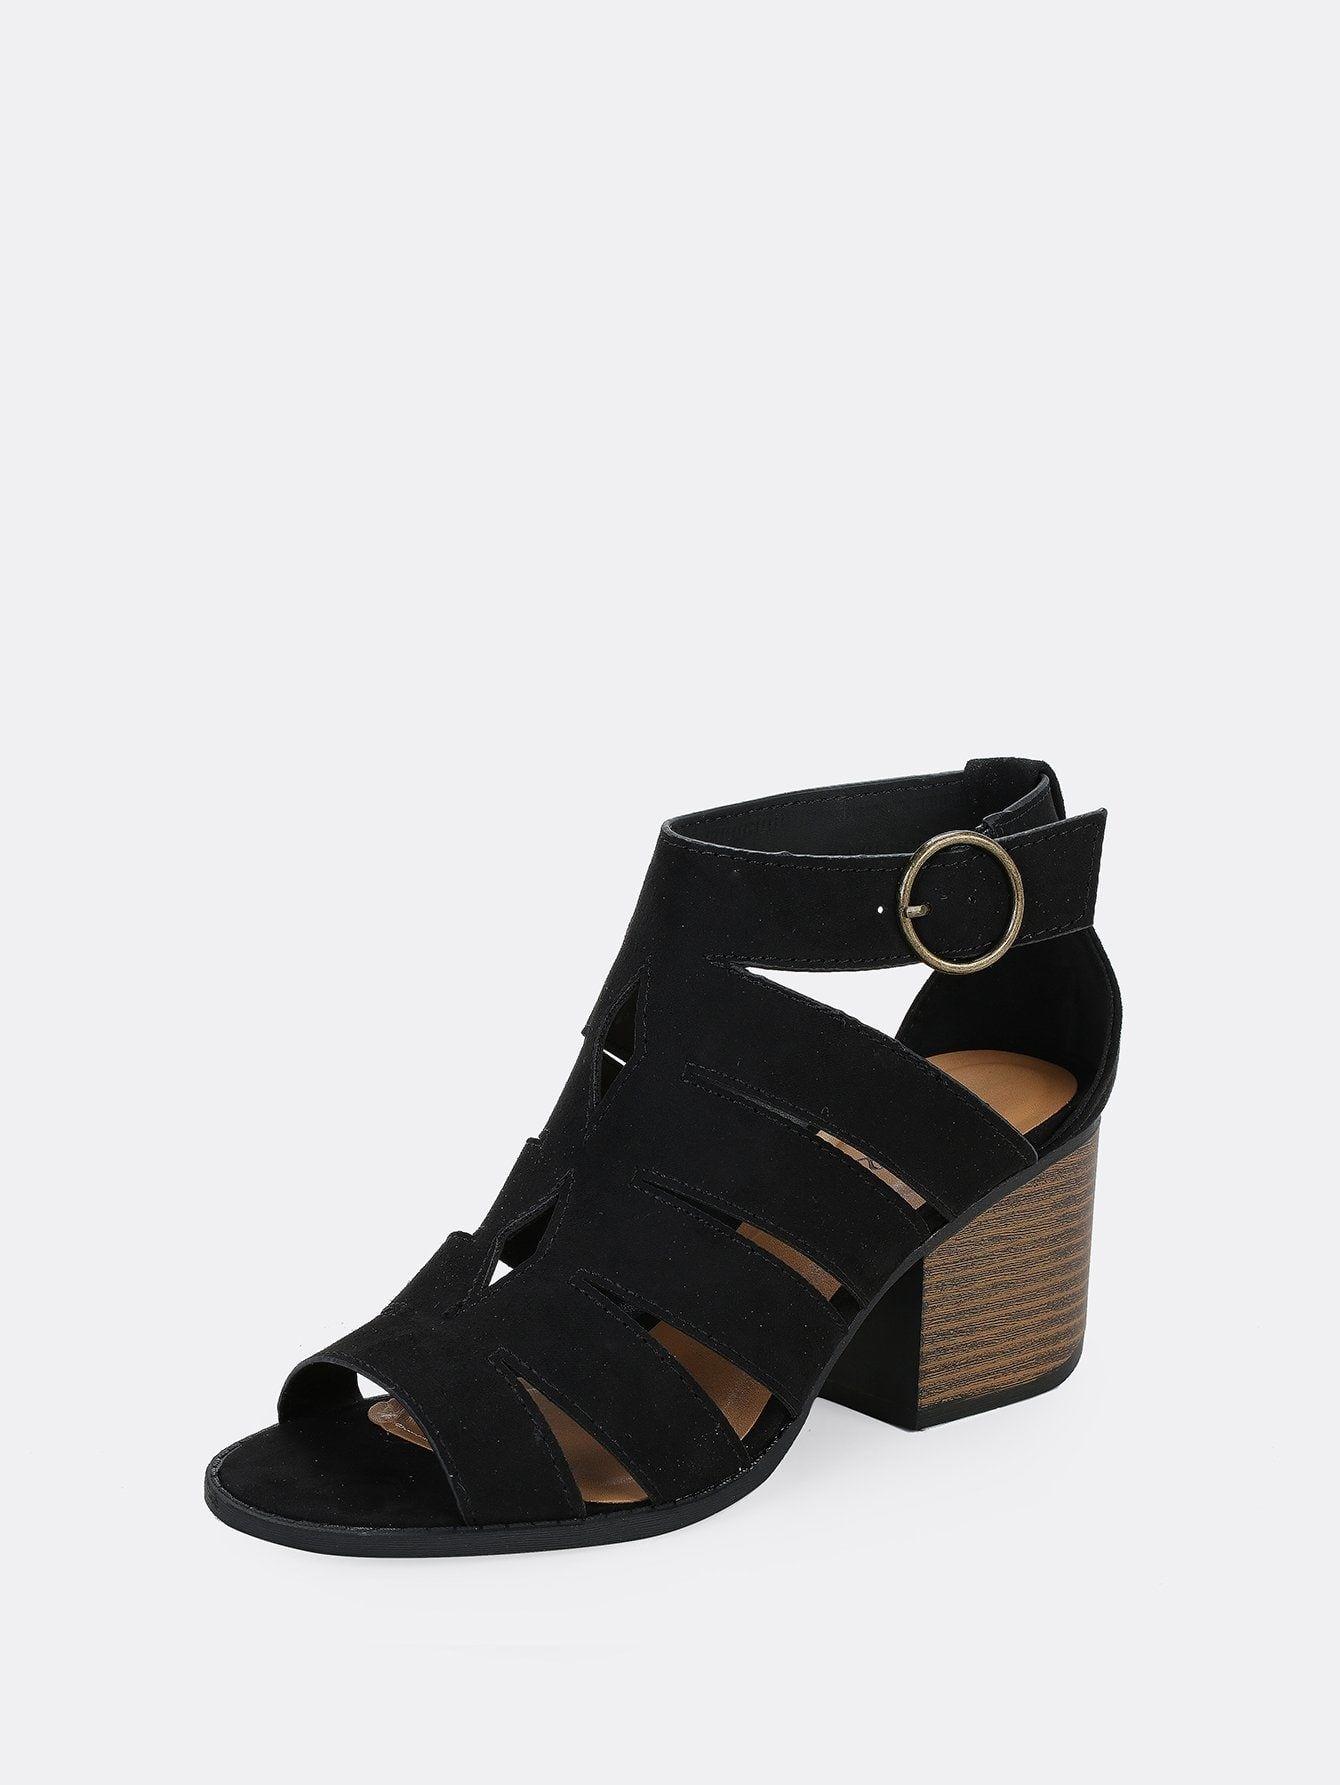 b582e20c4aa Casual Peep Toe Plain Black Mid Heel Chunky Caged Cut Out Side Buckle Chunky  Heel Sandals